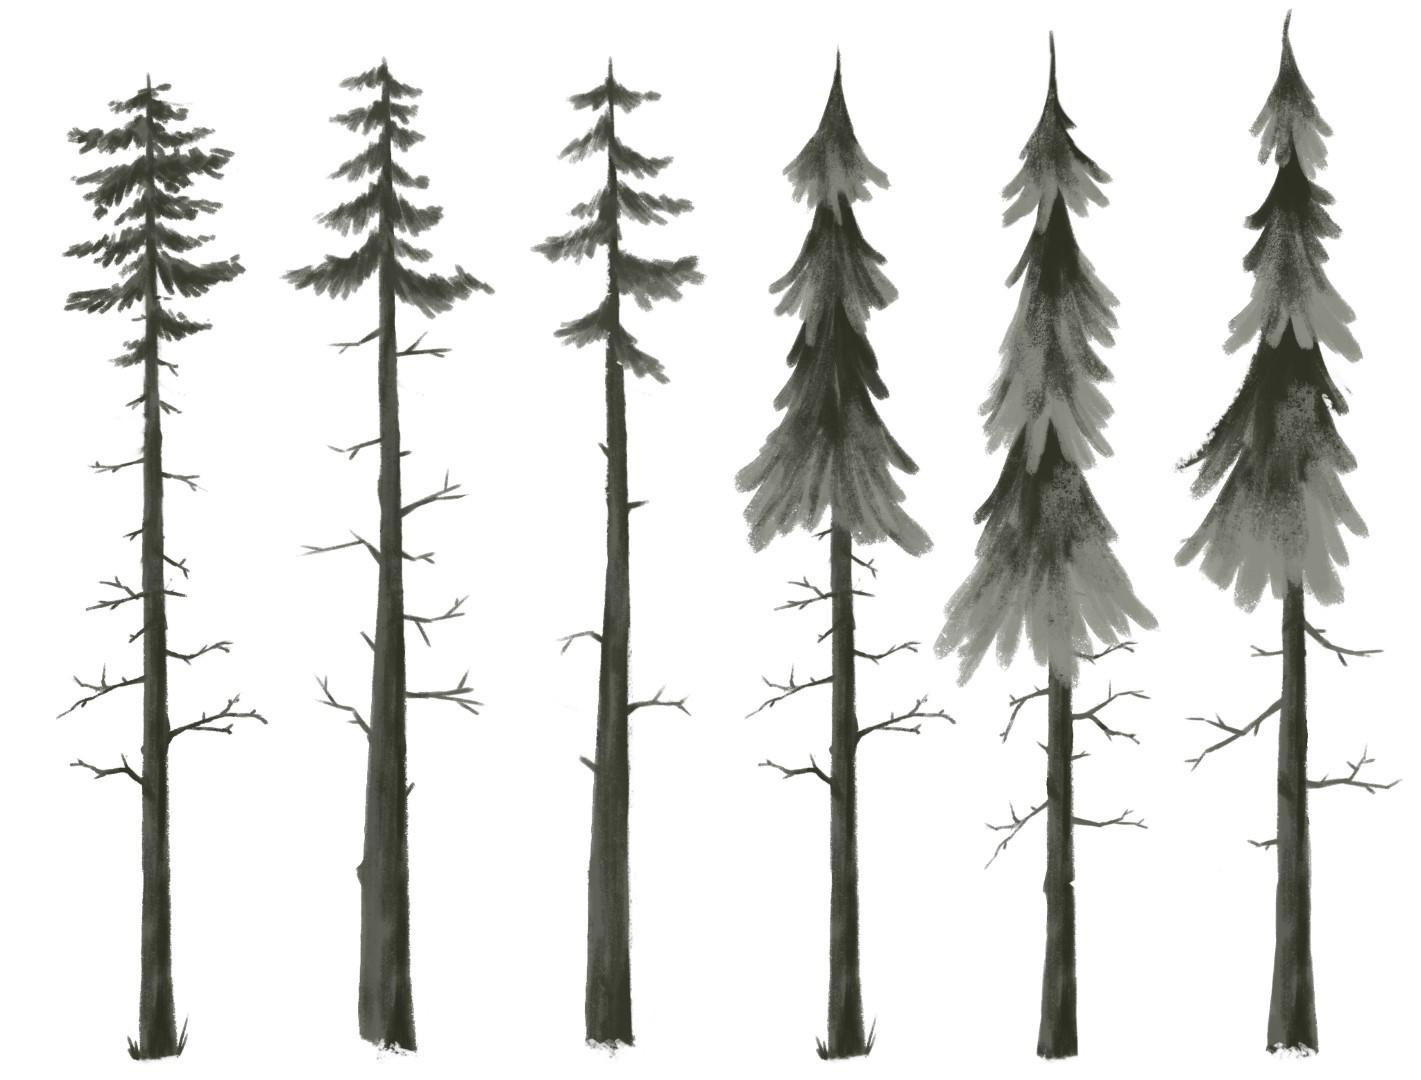 Ethan yazel imagebrew sketch trees 02 large